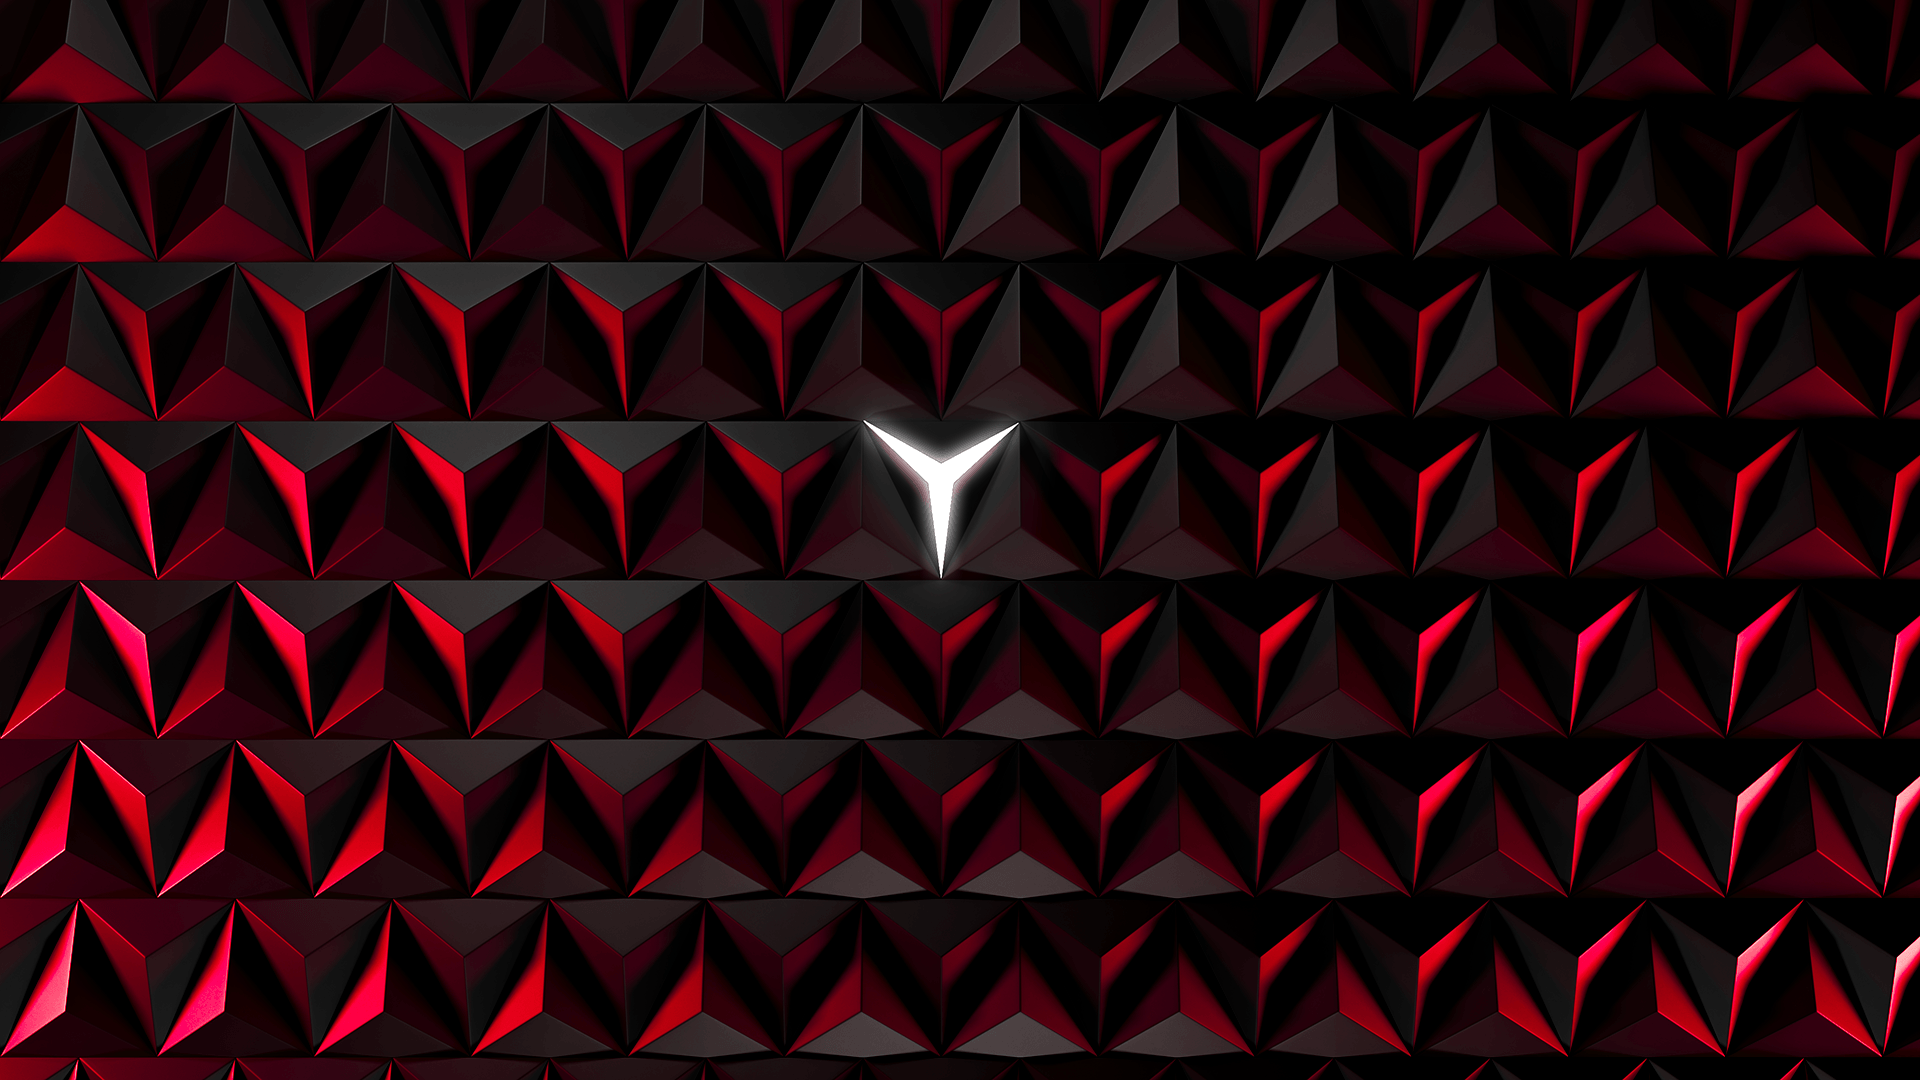 46+] Lenovo Legion Wallpapers on WallpaperSafari